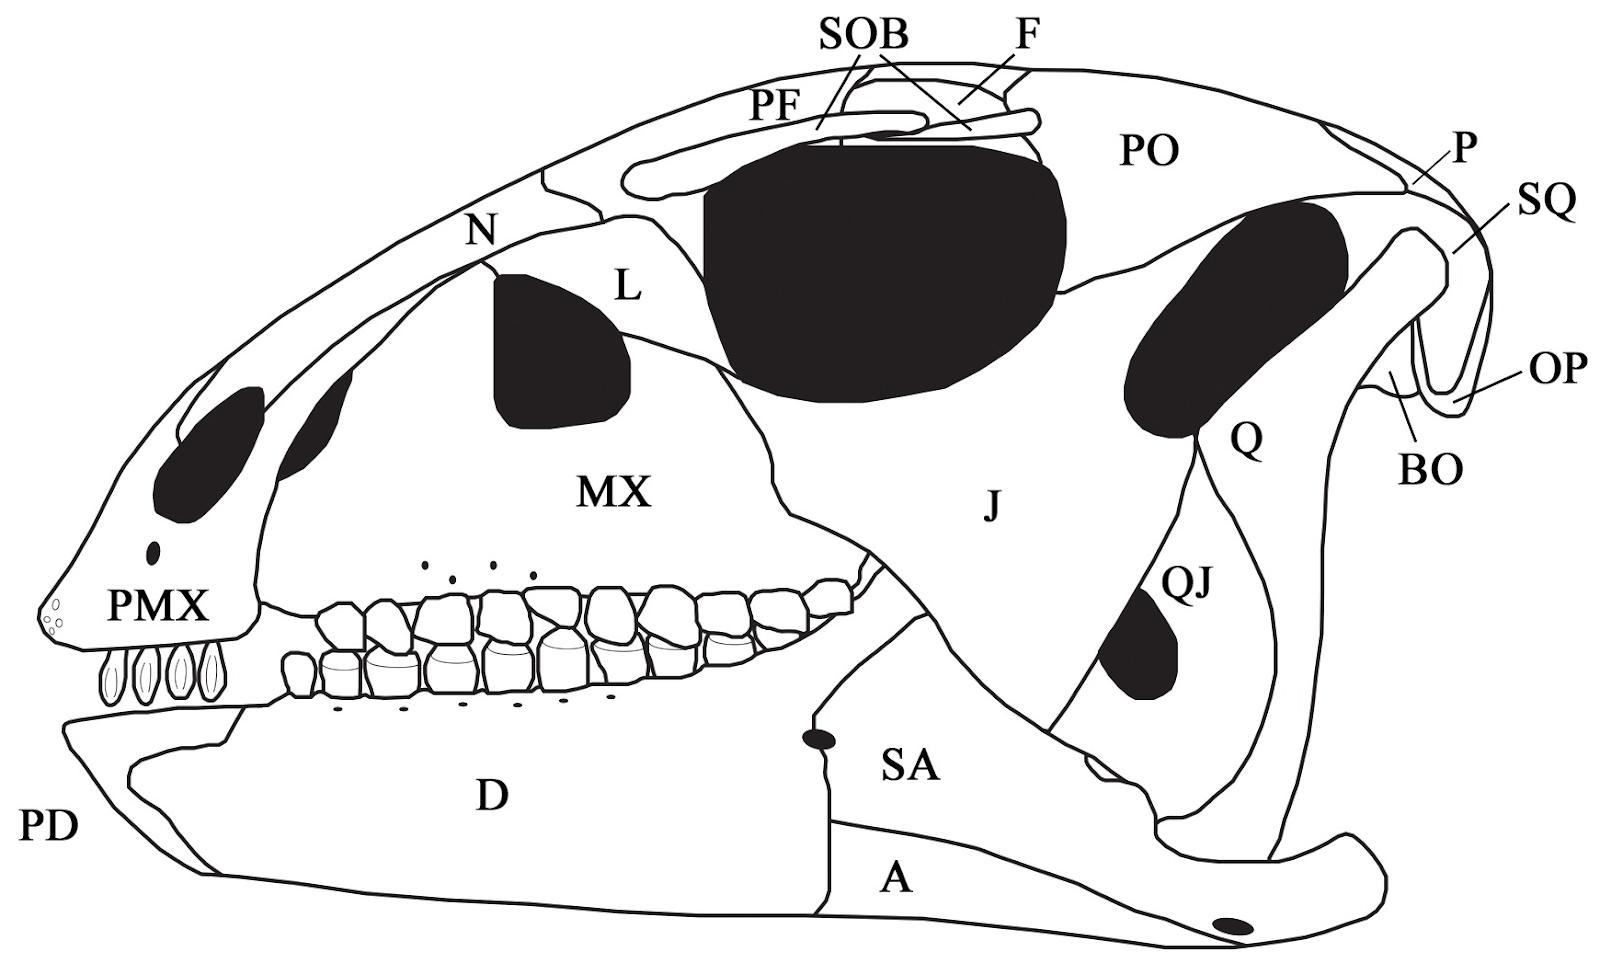 Convolosaurus marri